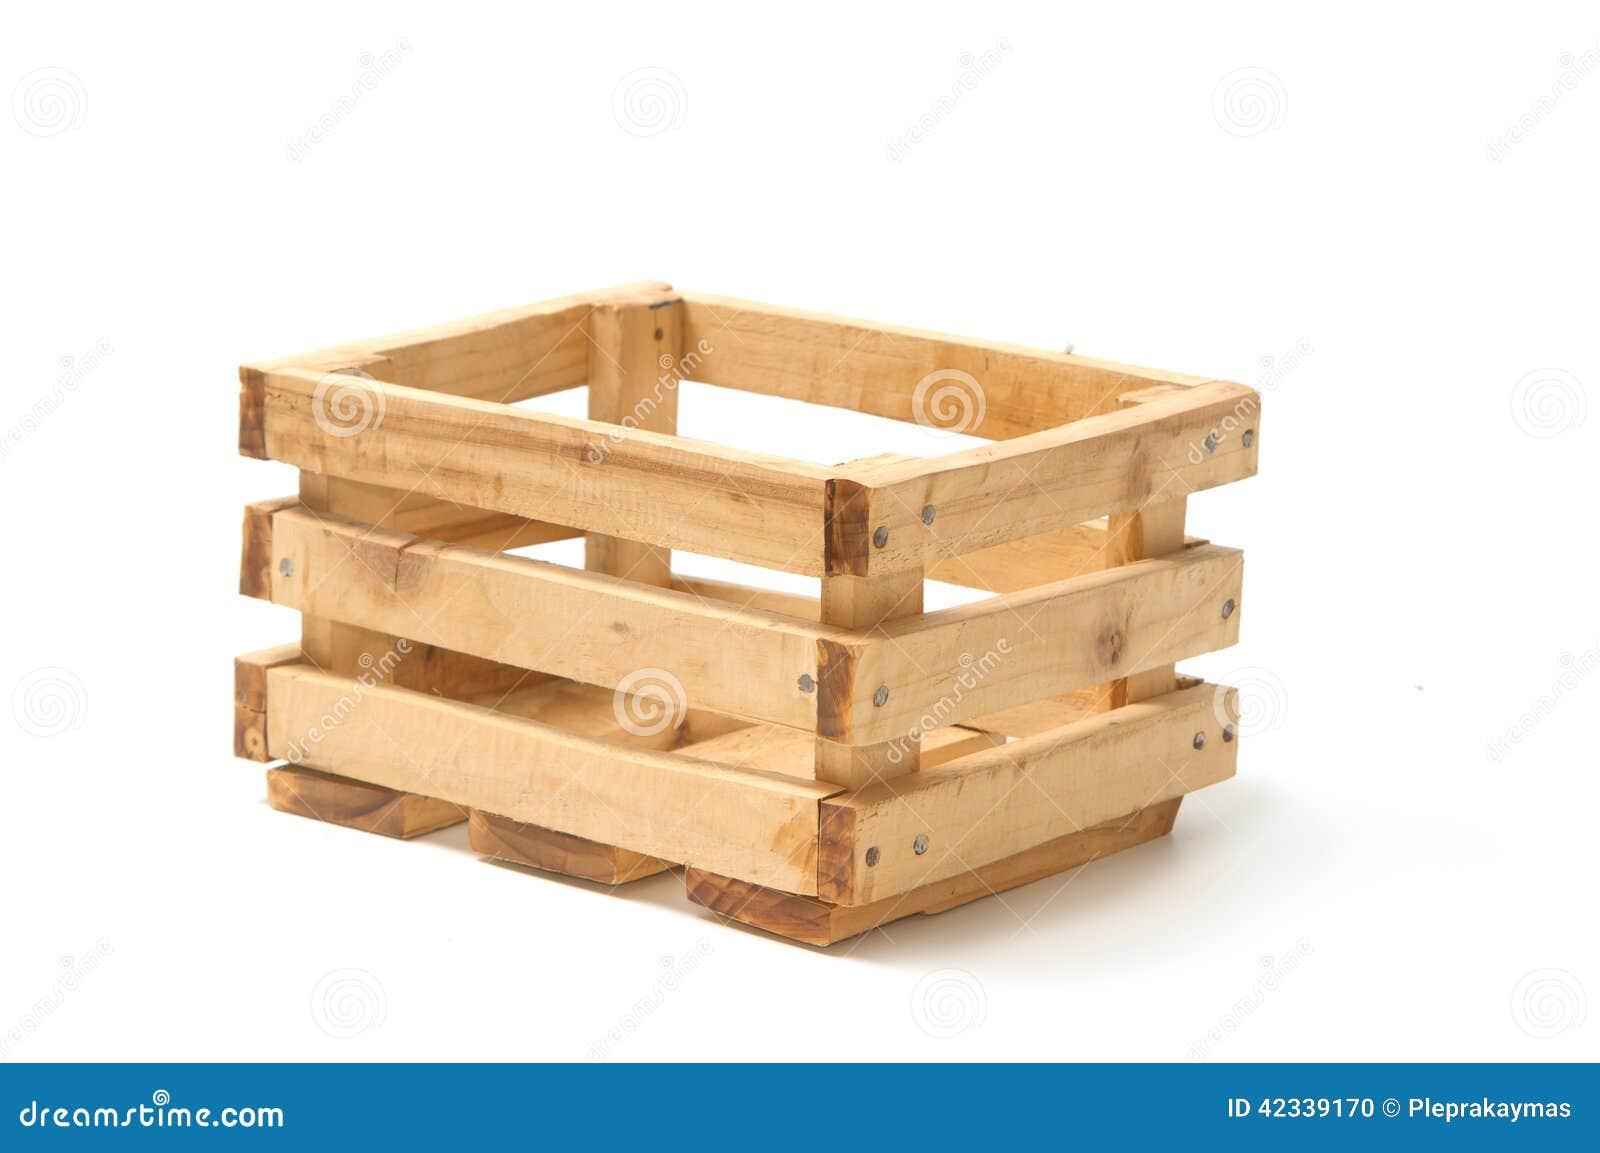 Caj n de madera vac o de la fruta foto de archivo imagen - Cajones de fruta de madera ...